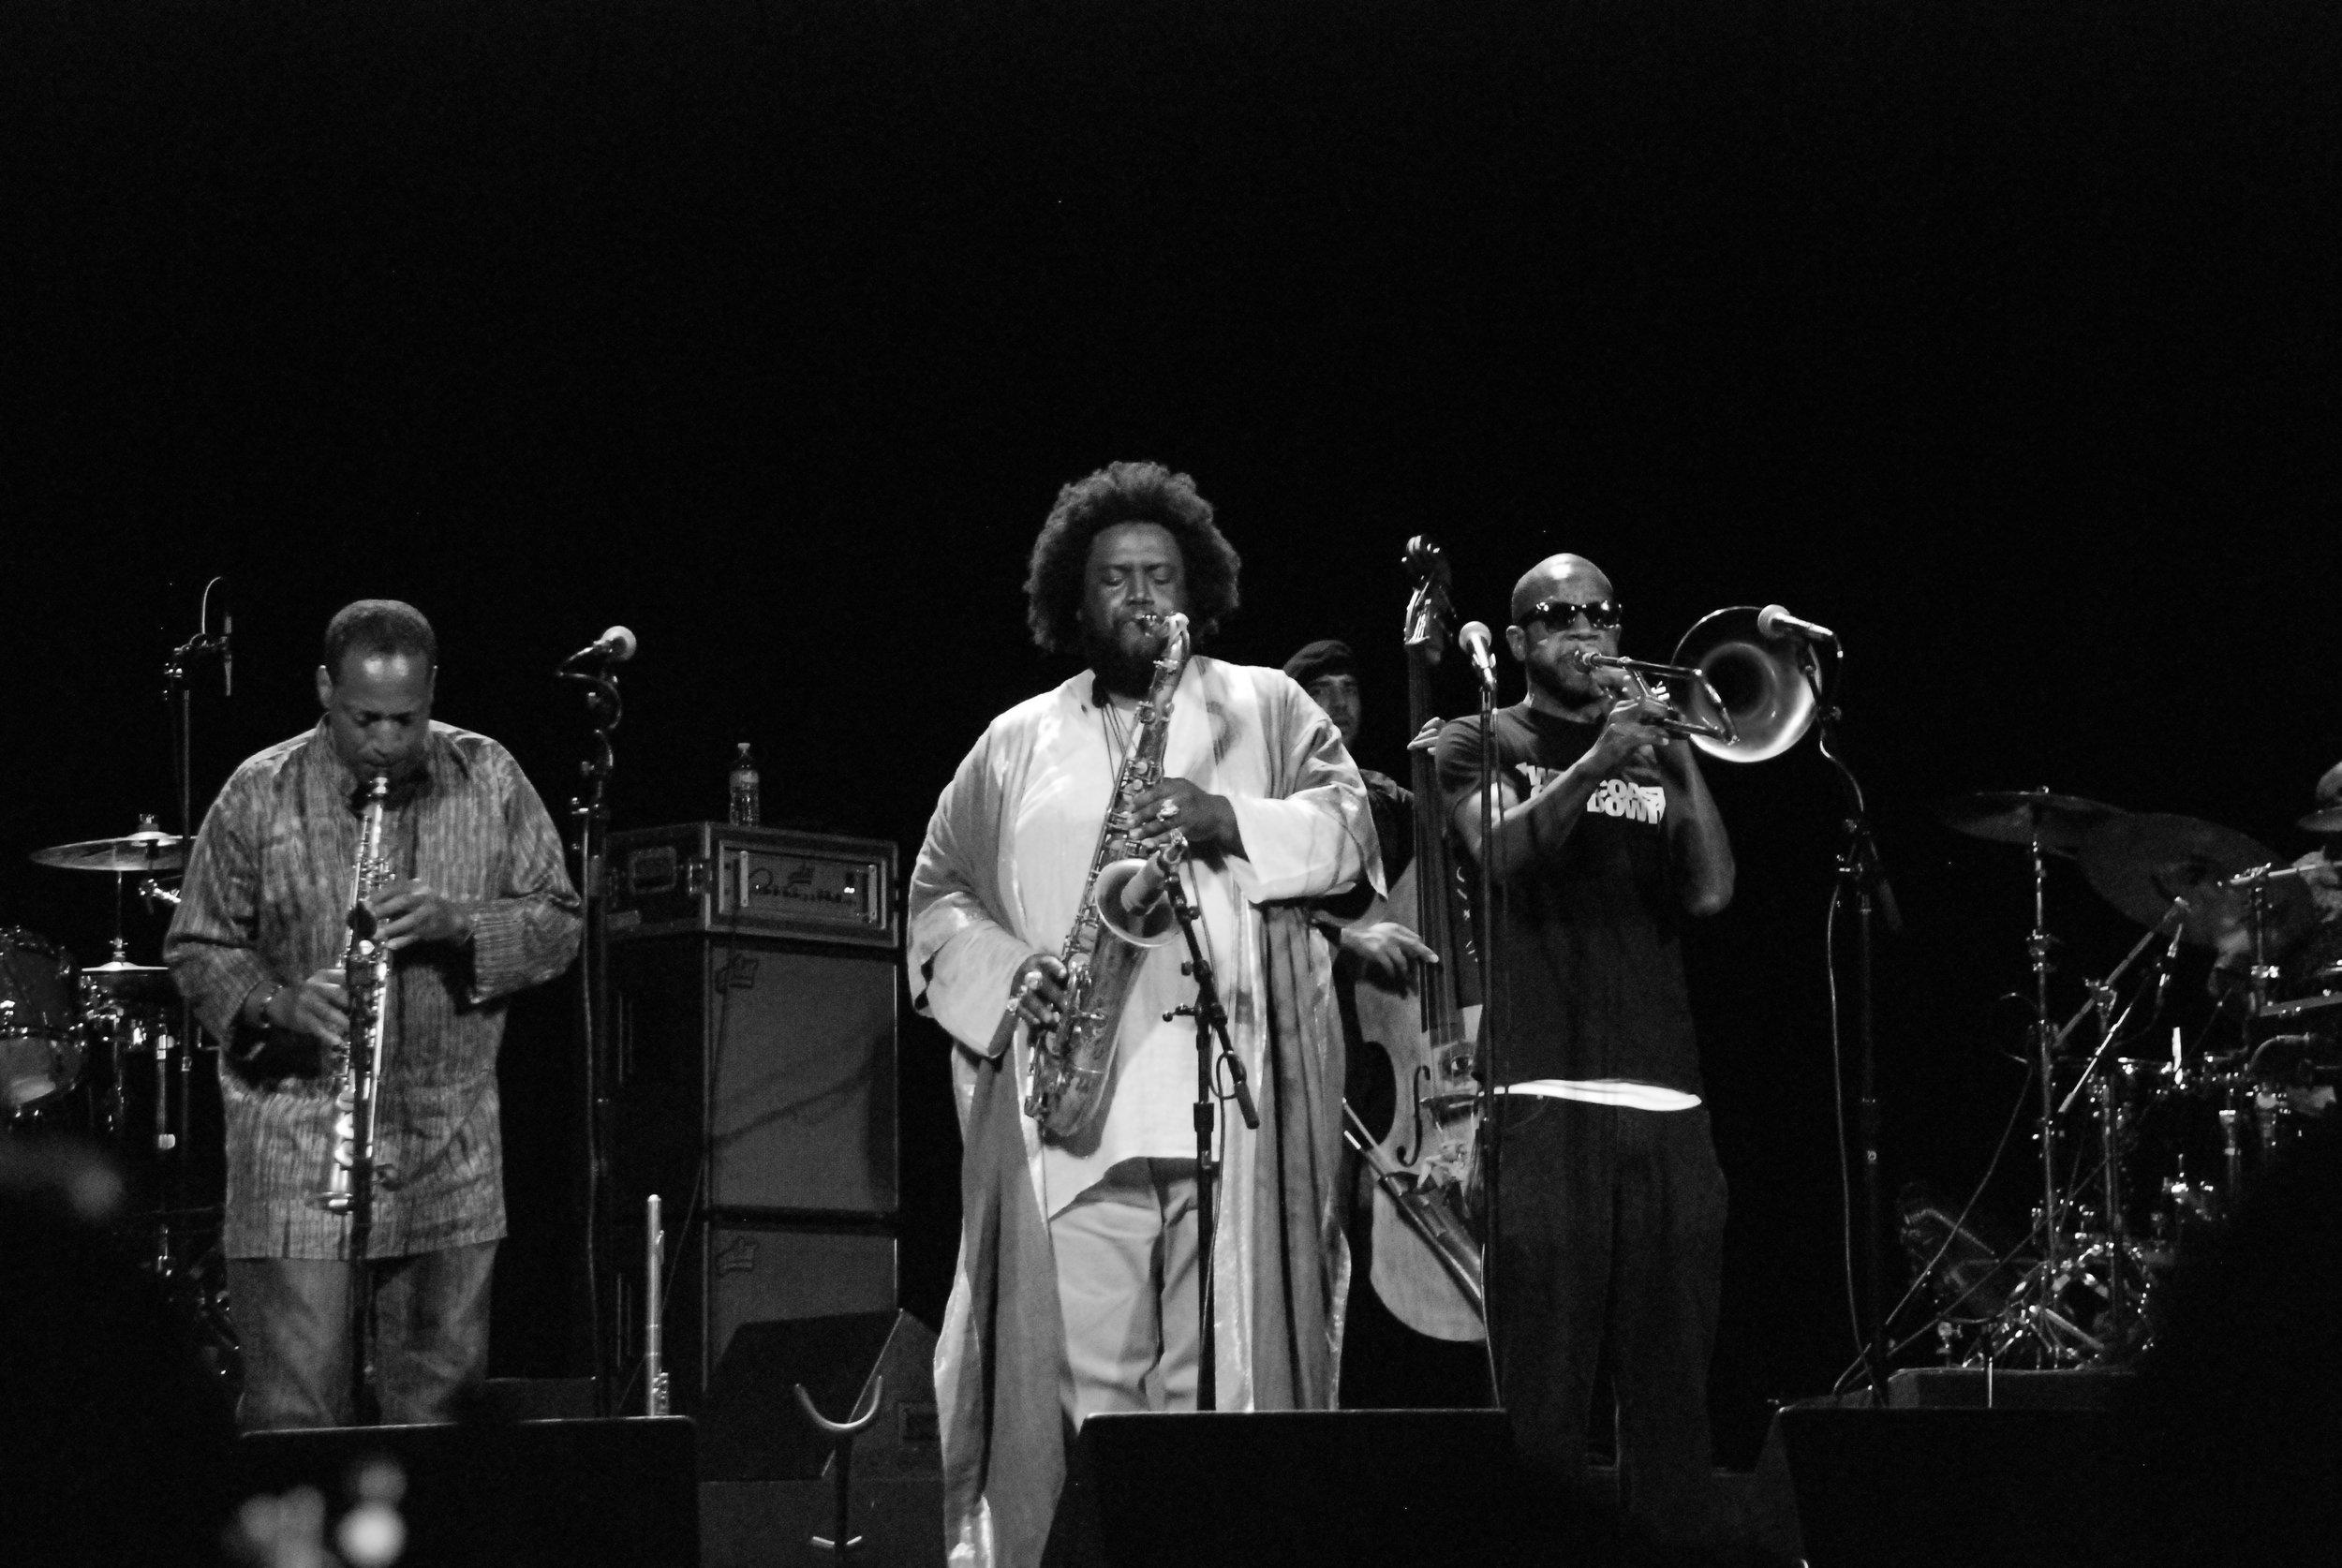 From Left to Right: Rickey Washington (Soprano Sax), Kamasi Washington (Tenor Sax), Miles Mosley (Bass), Ryan Porter (Trombone)